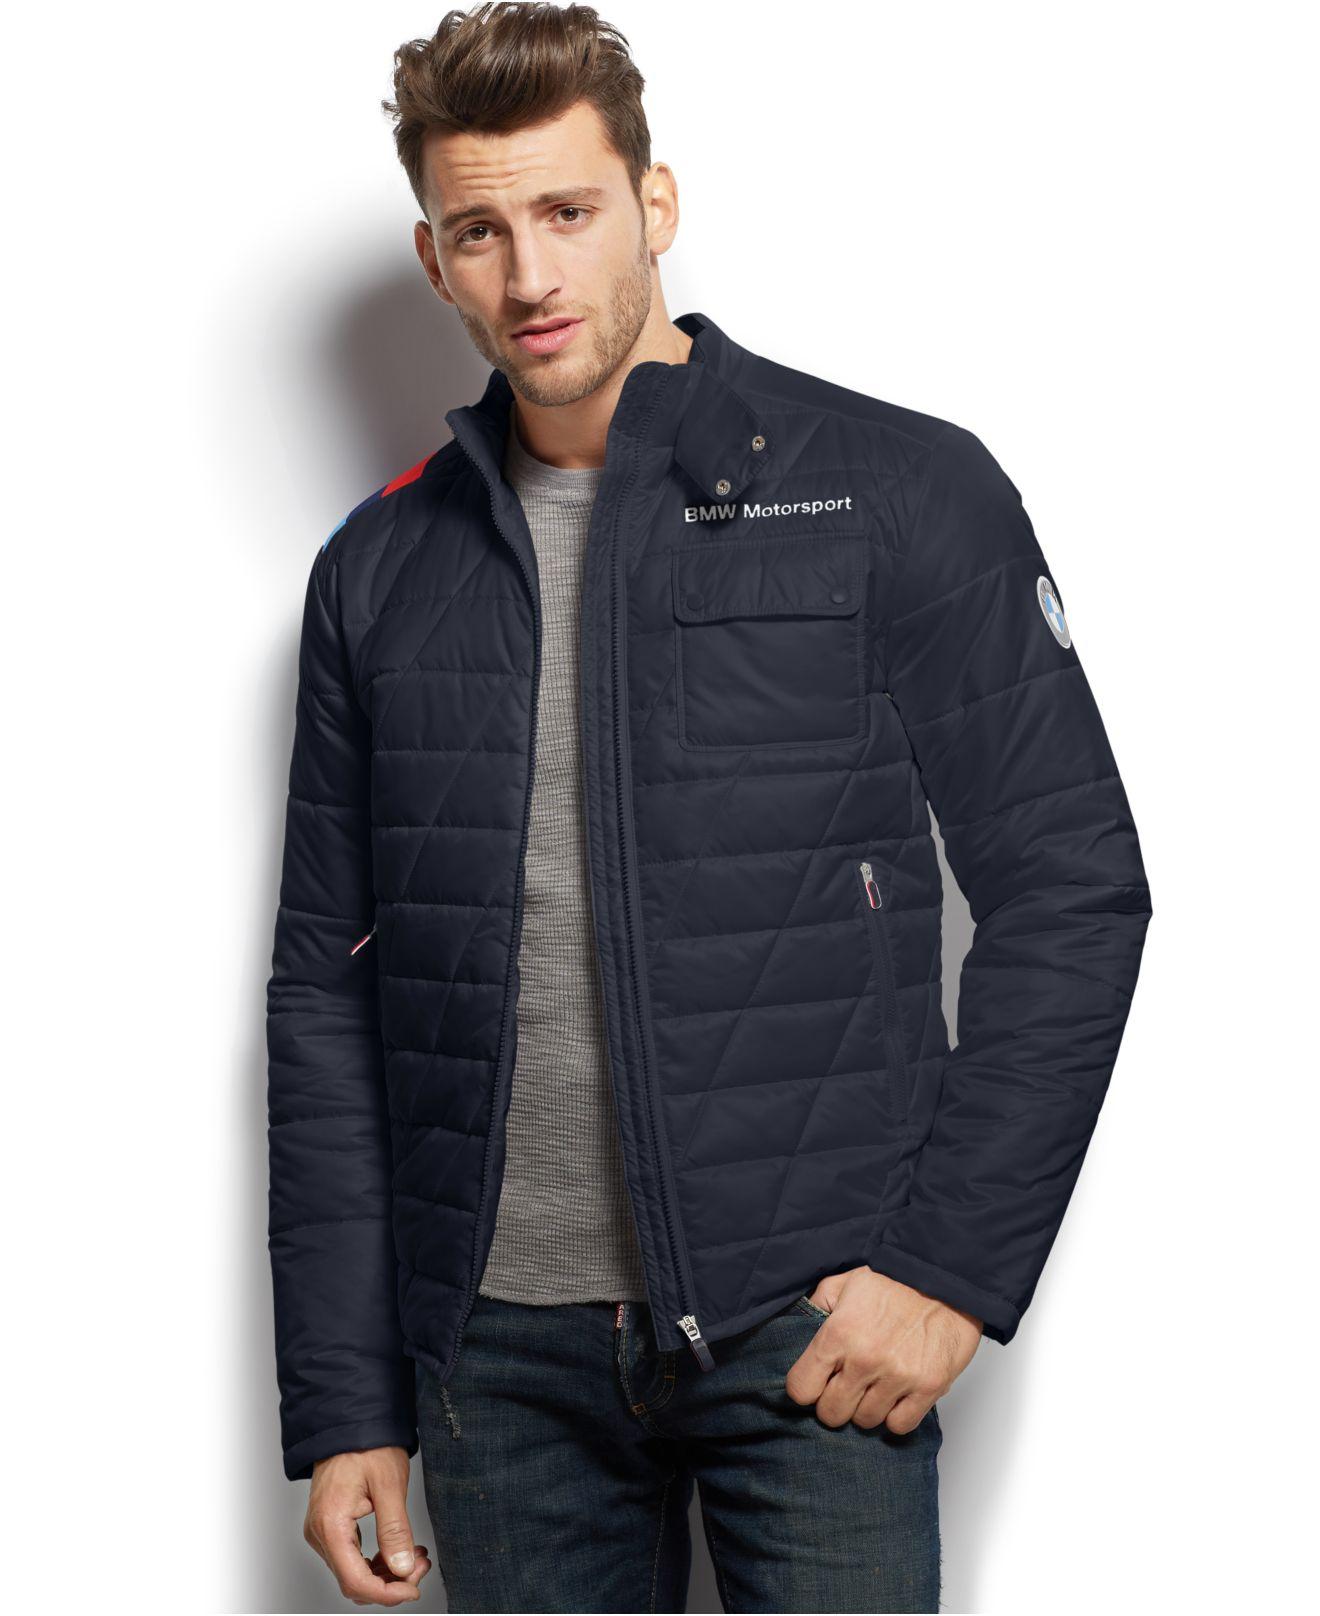 Lyst - Puma Bmw Motorsport Padded Jacket in Blue for Men : puma quilted jacket - Adamdwight.com